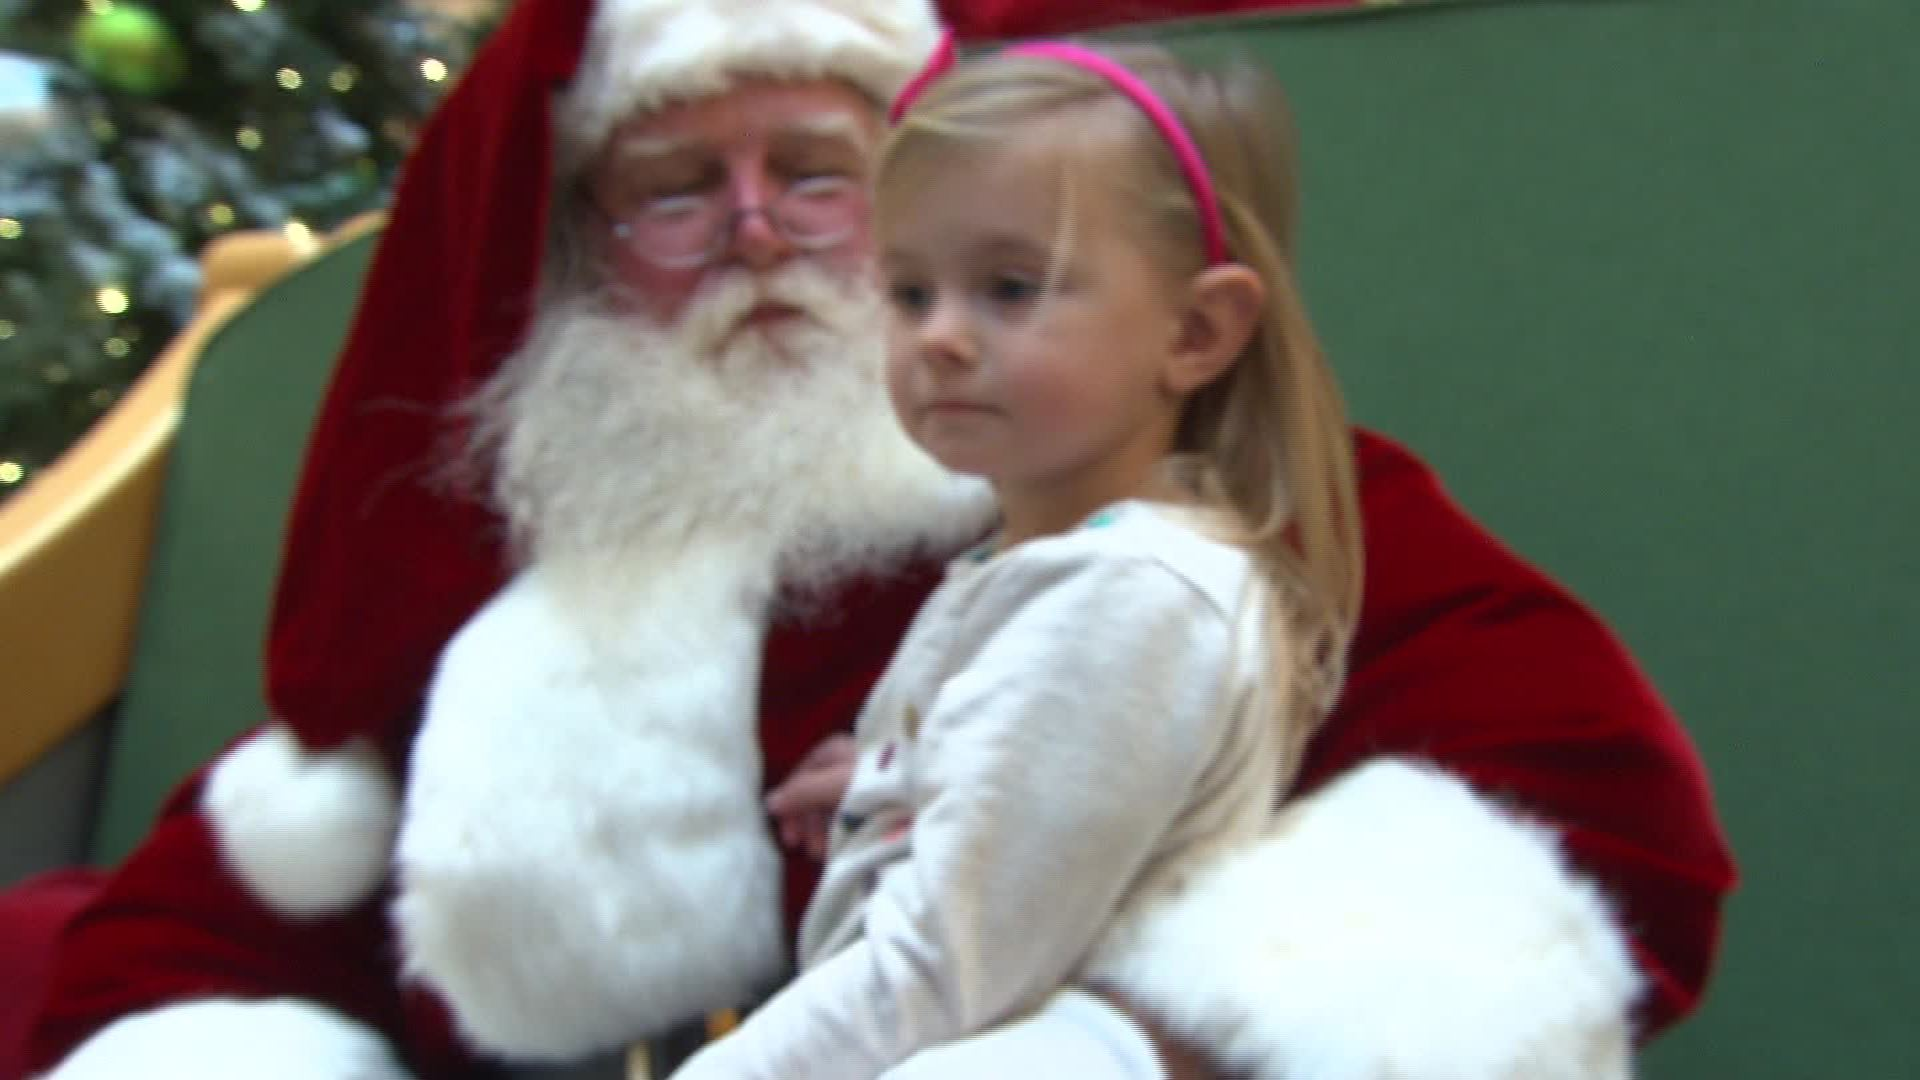 pastor to kids santa is a man in a suit cnn video - Kids Santa